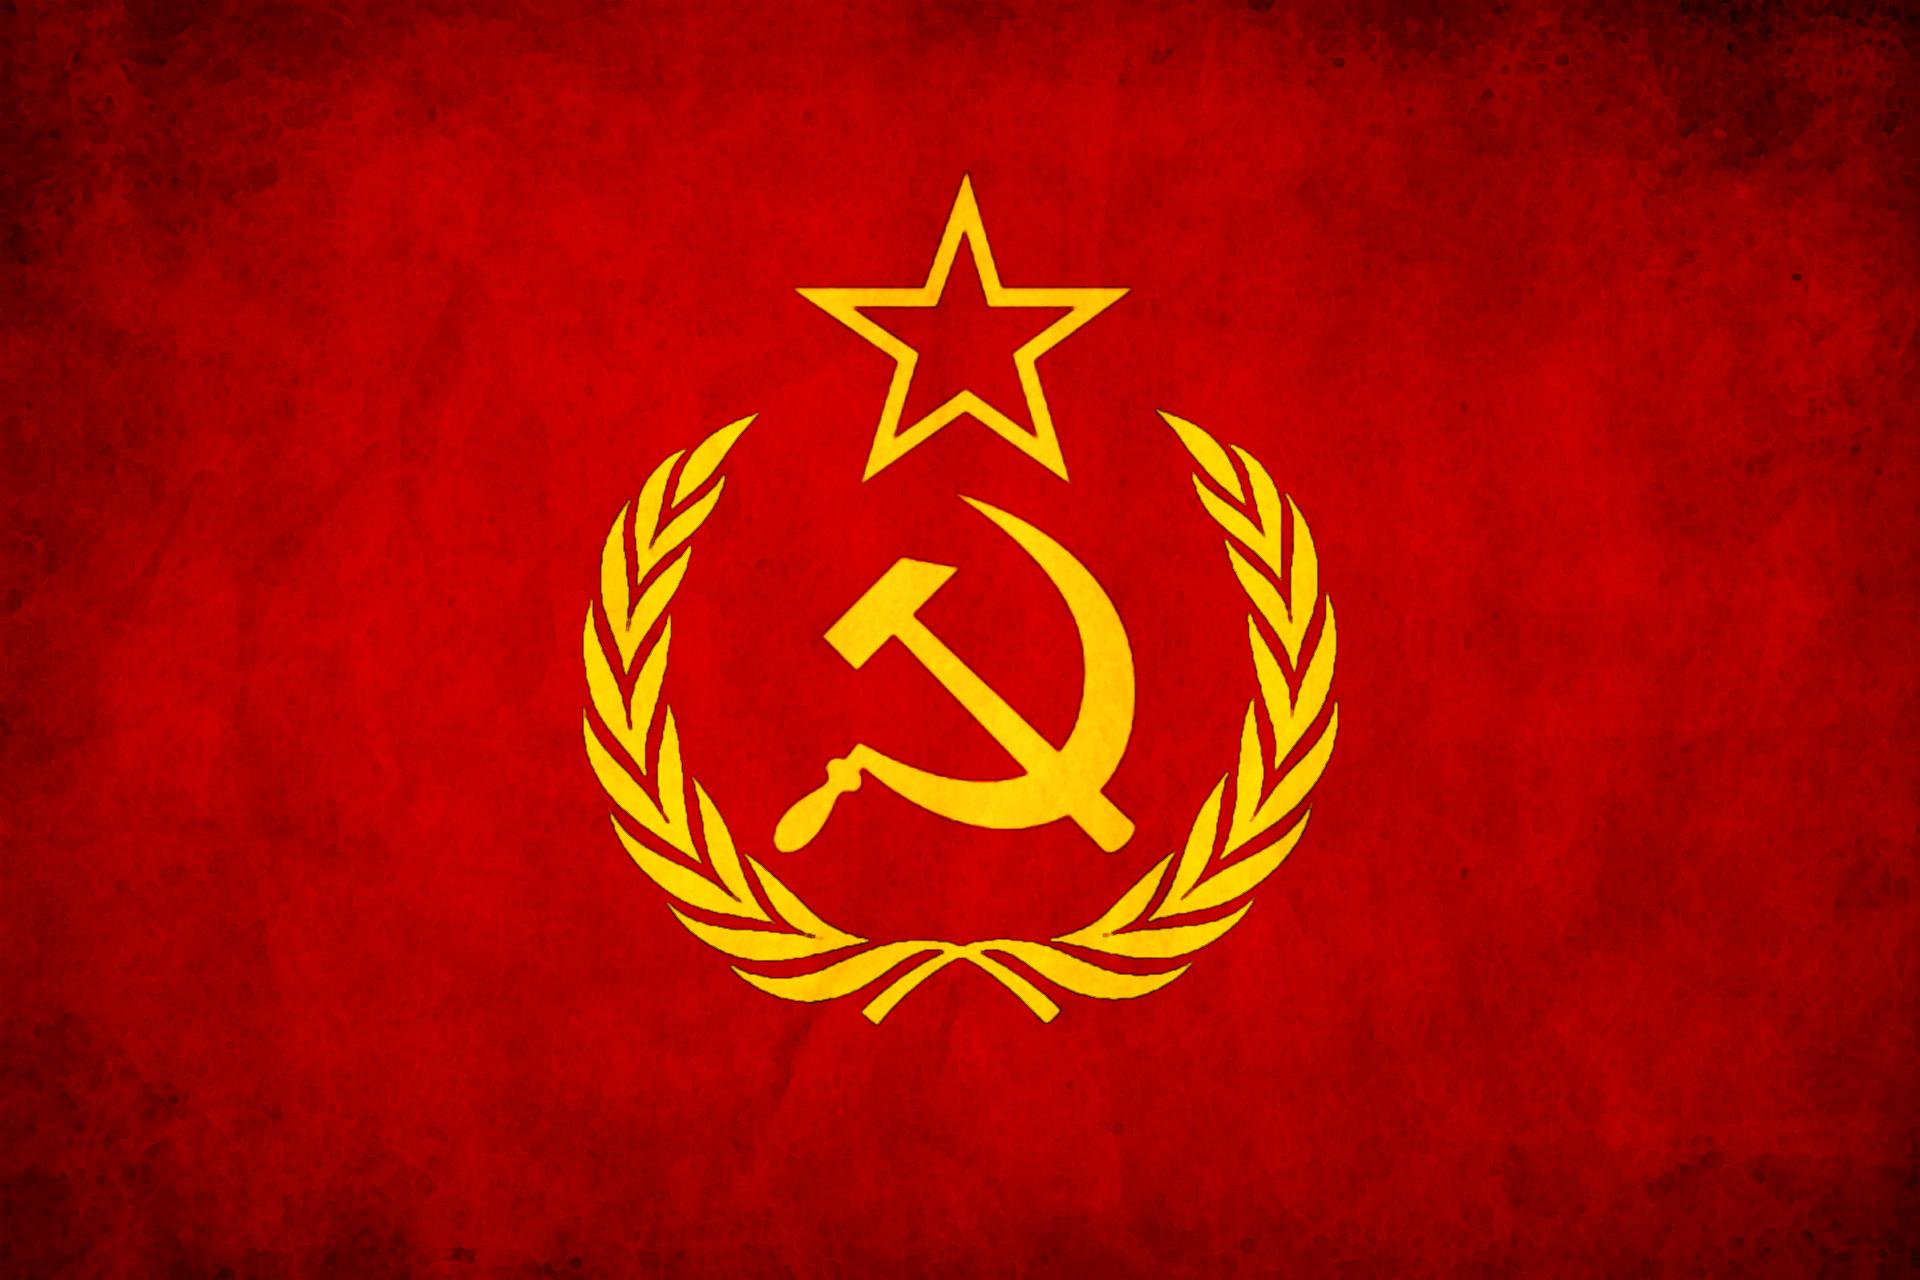 Socialist Wallpapers 1920x1280